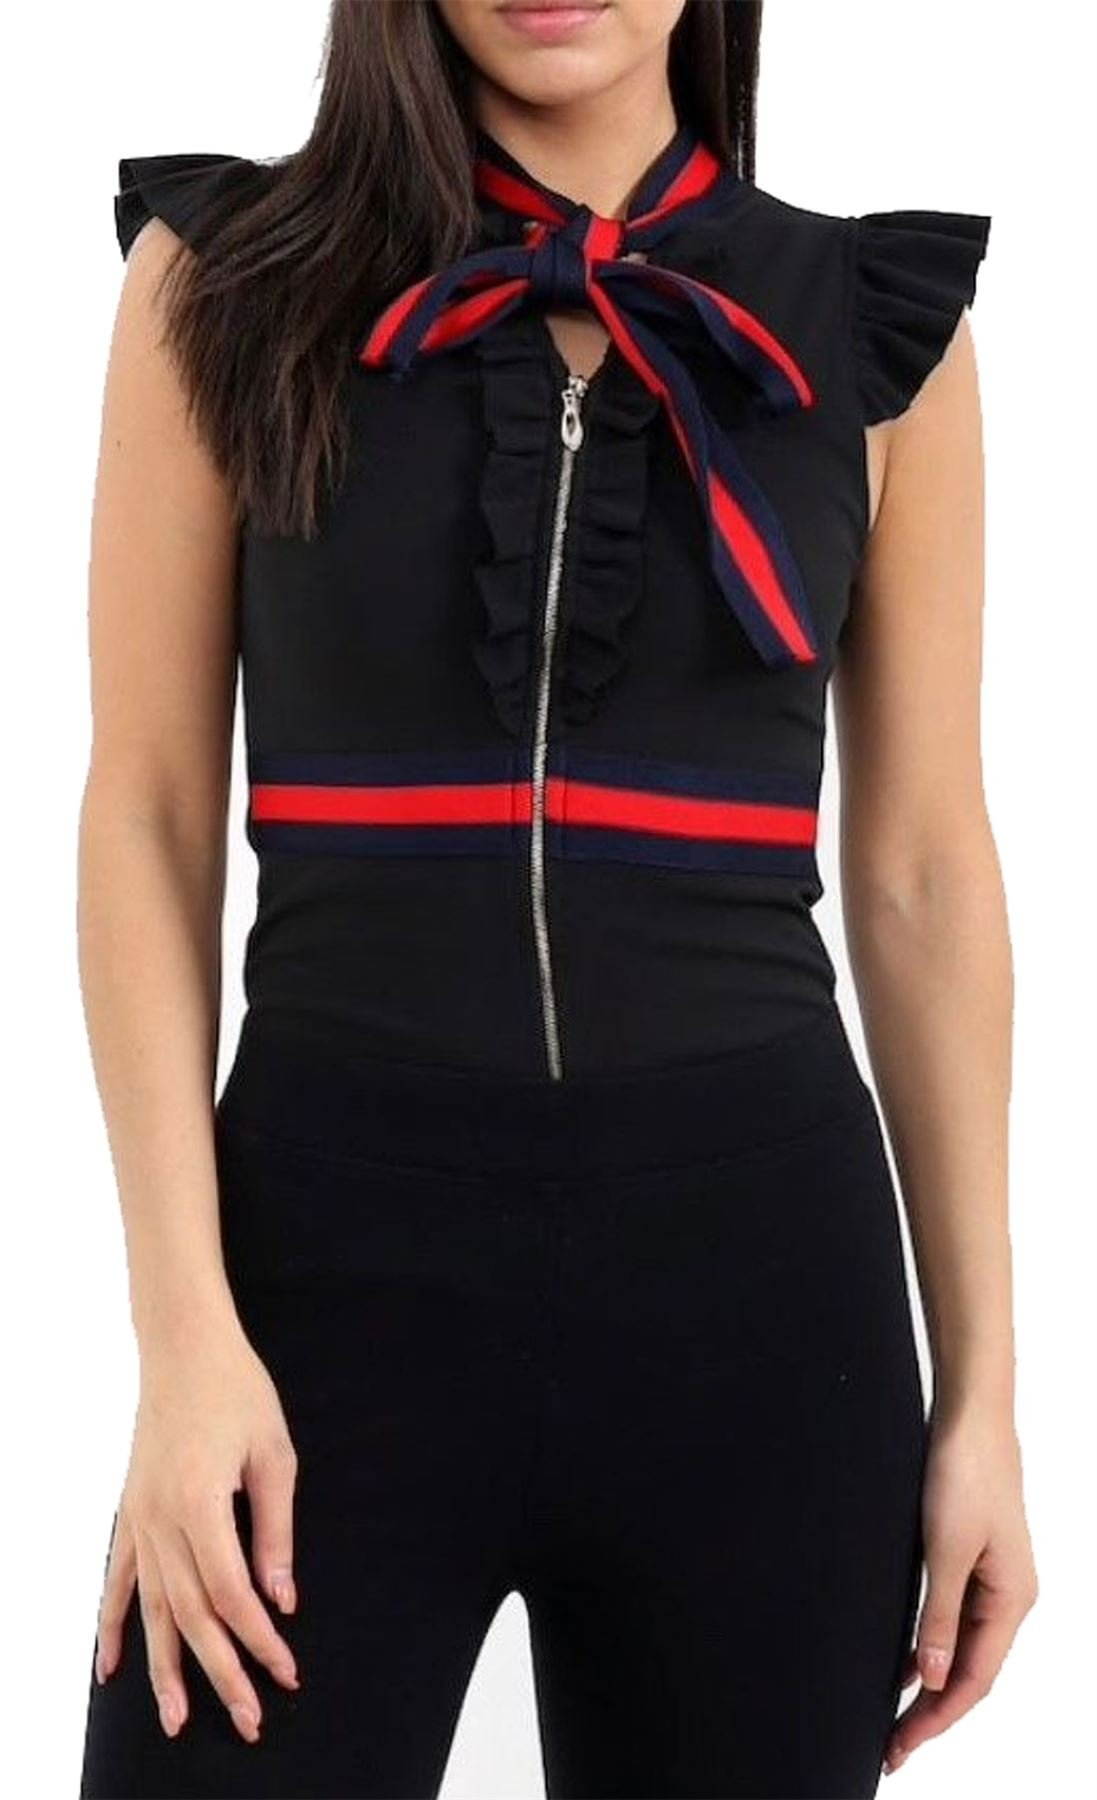 REAL LIFE FASHION LTD Womens Ruffle Frill Stripe Bodysuit Ladies Pussy Bow Detail Stripe Leotard Top#(Black Ruffle Frill Stripe Bodysuit#US 6-8#Womens)